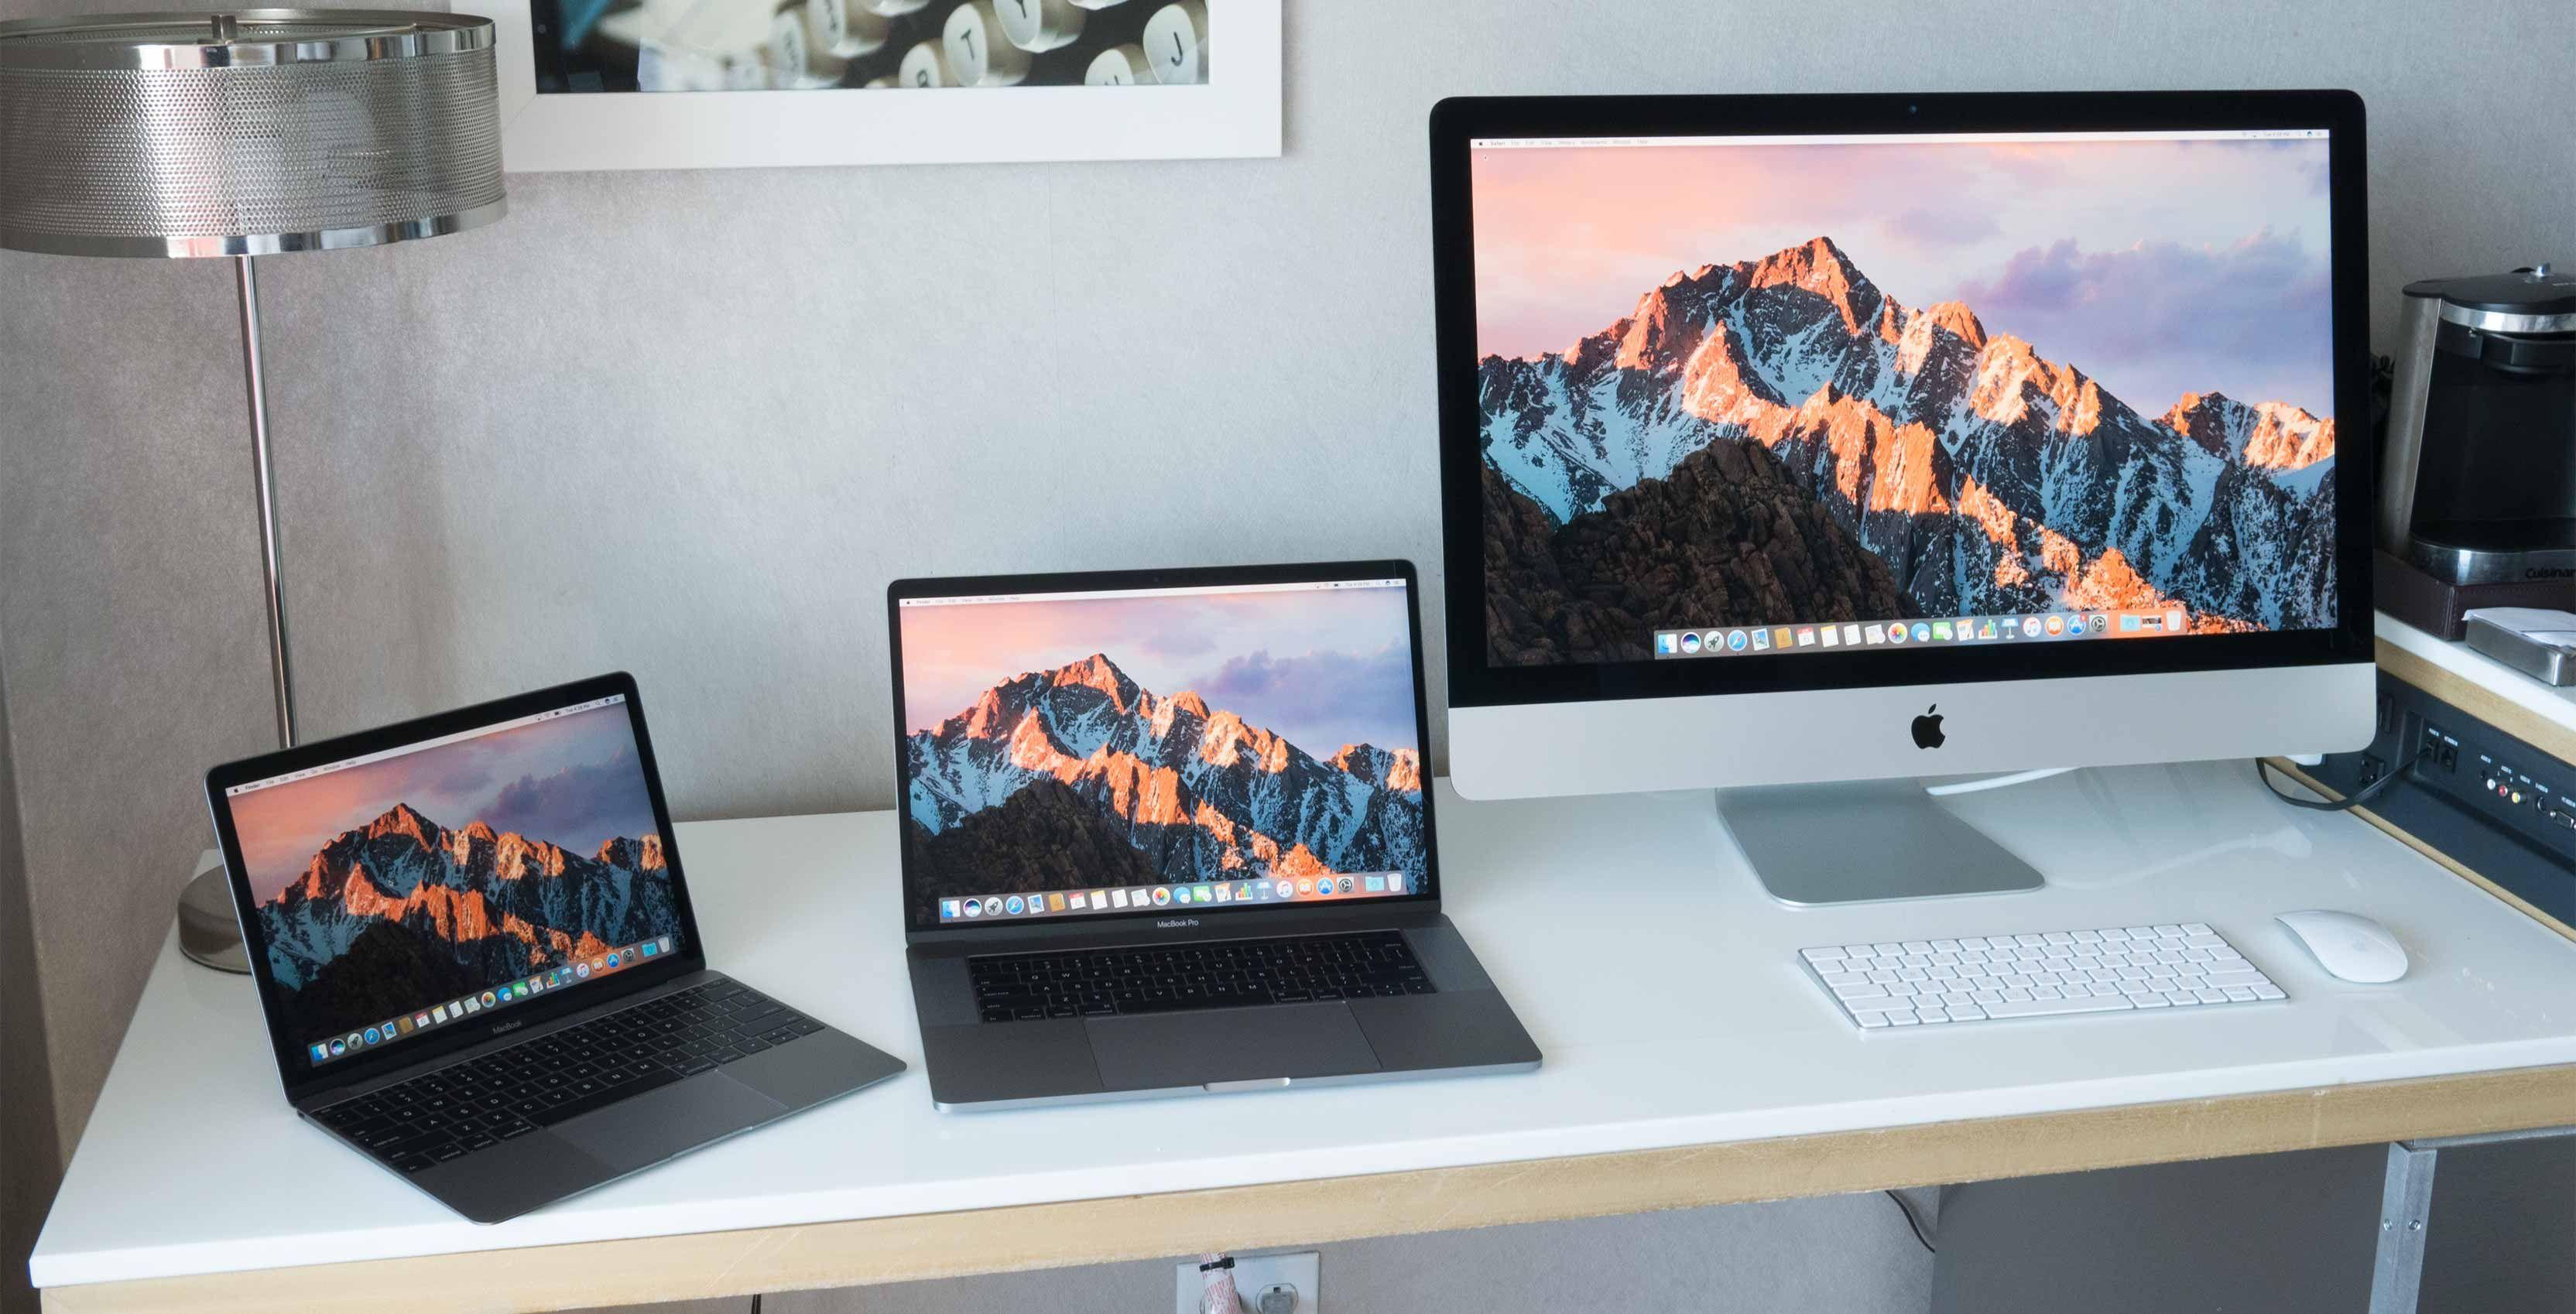 How To Configure Wifi On Mac Mac Tutorial Adobe Creative Cloud Tutorials Apple